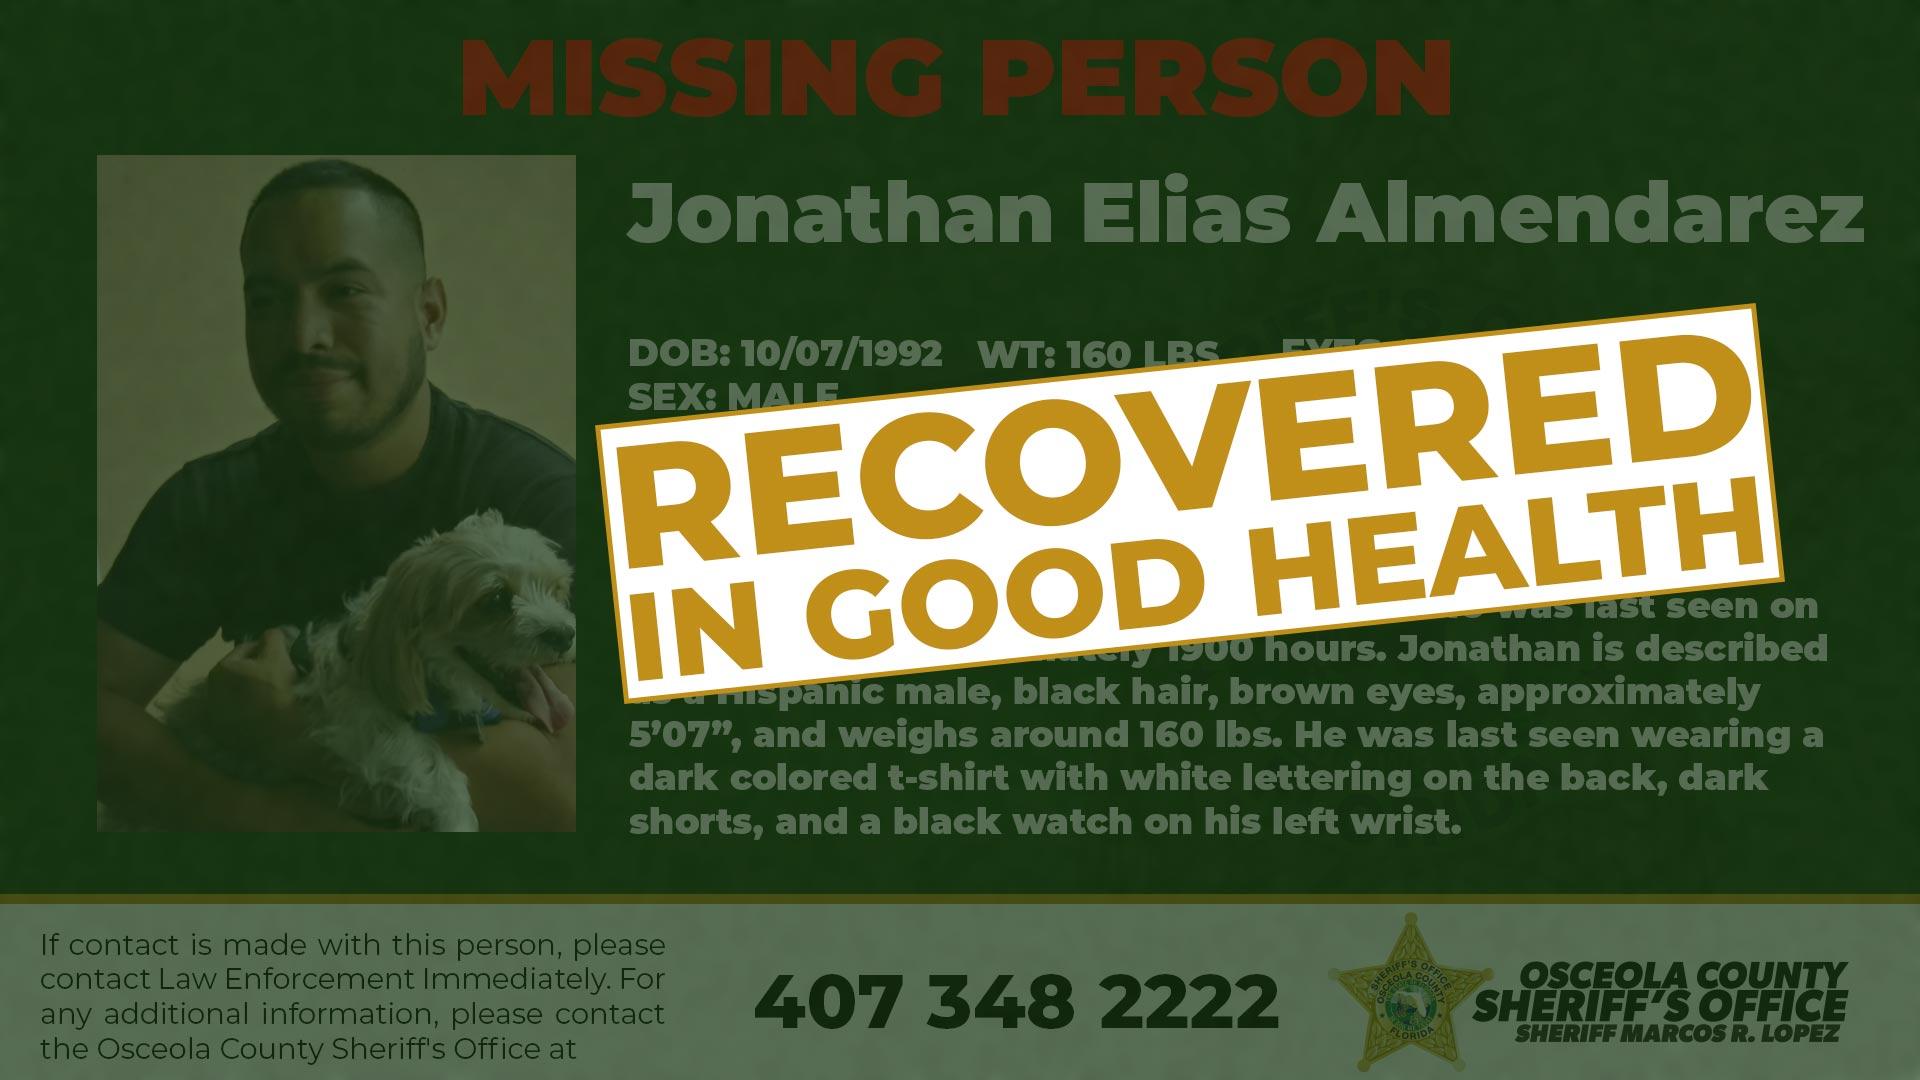 Missing_person_ Jonathan Elias Almendarez_FOUND_c